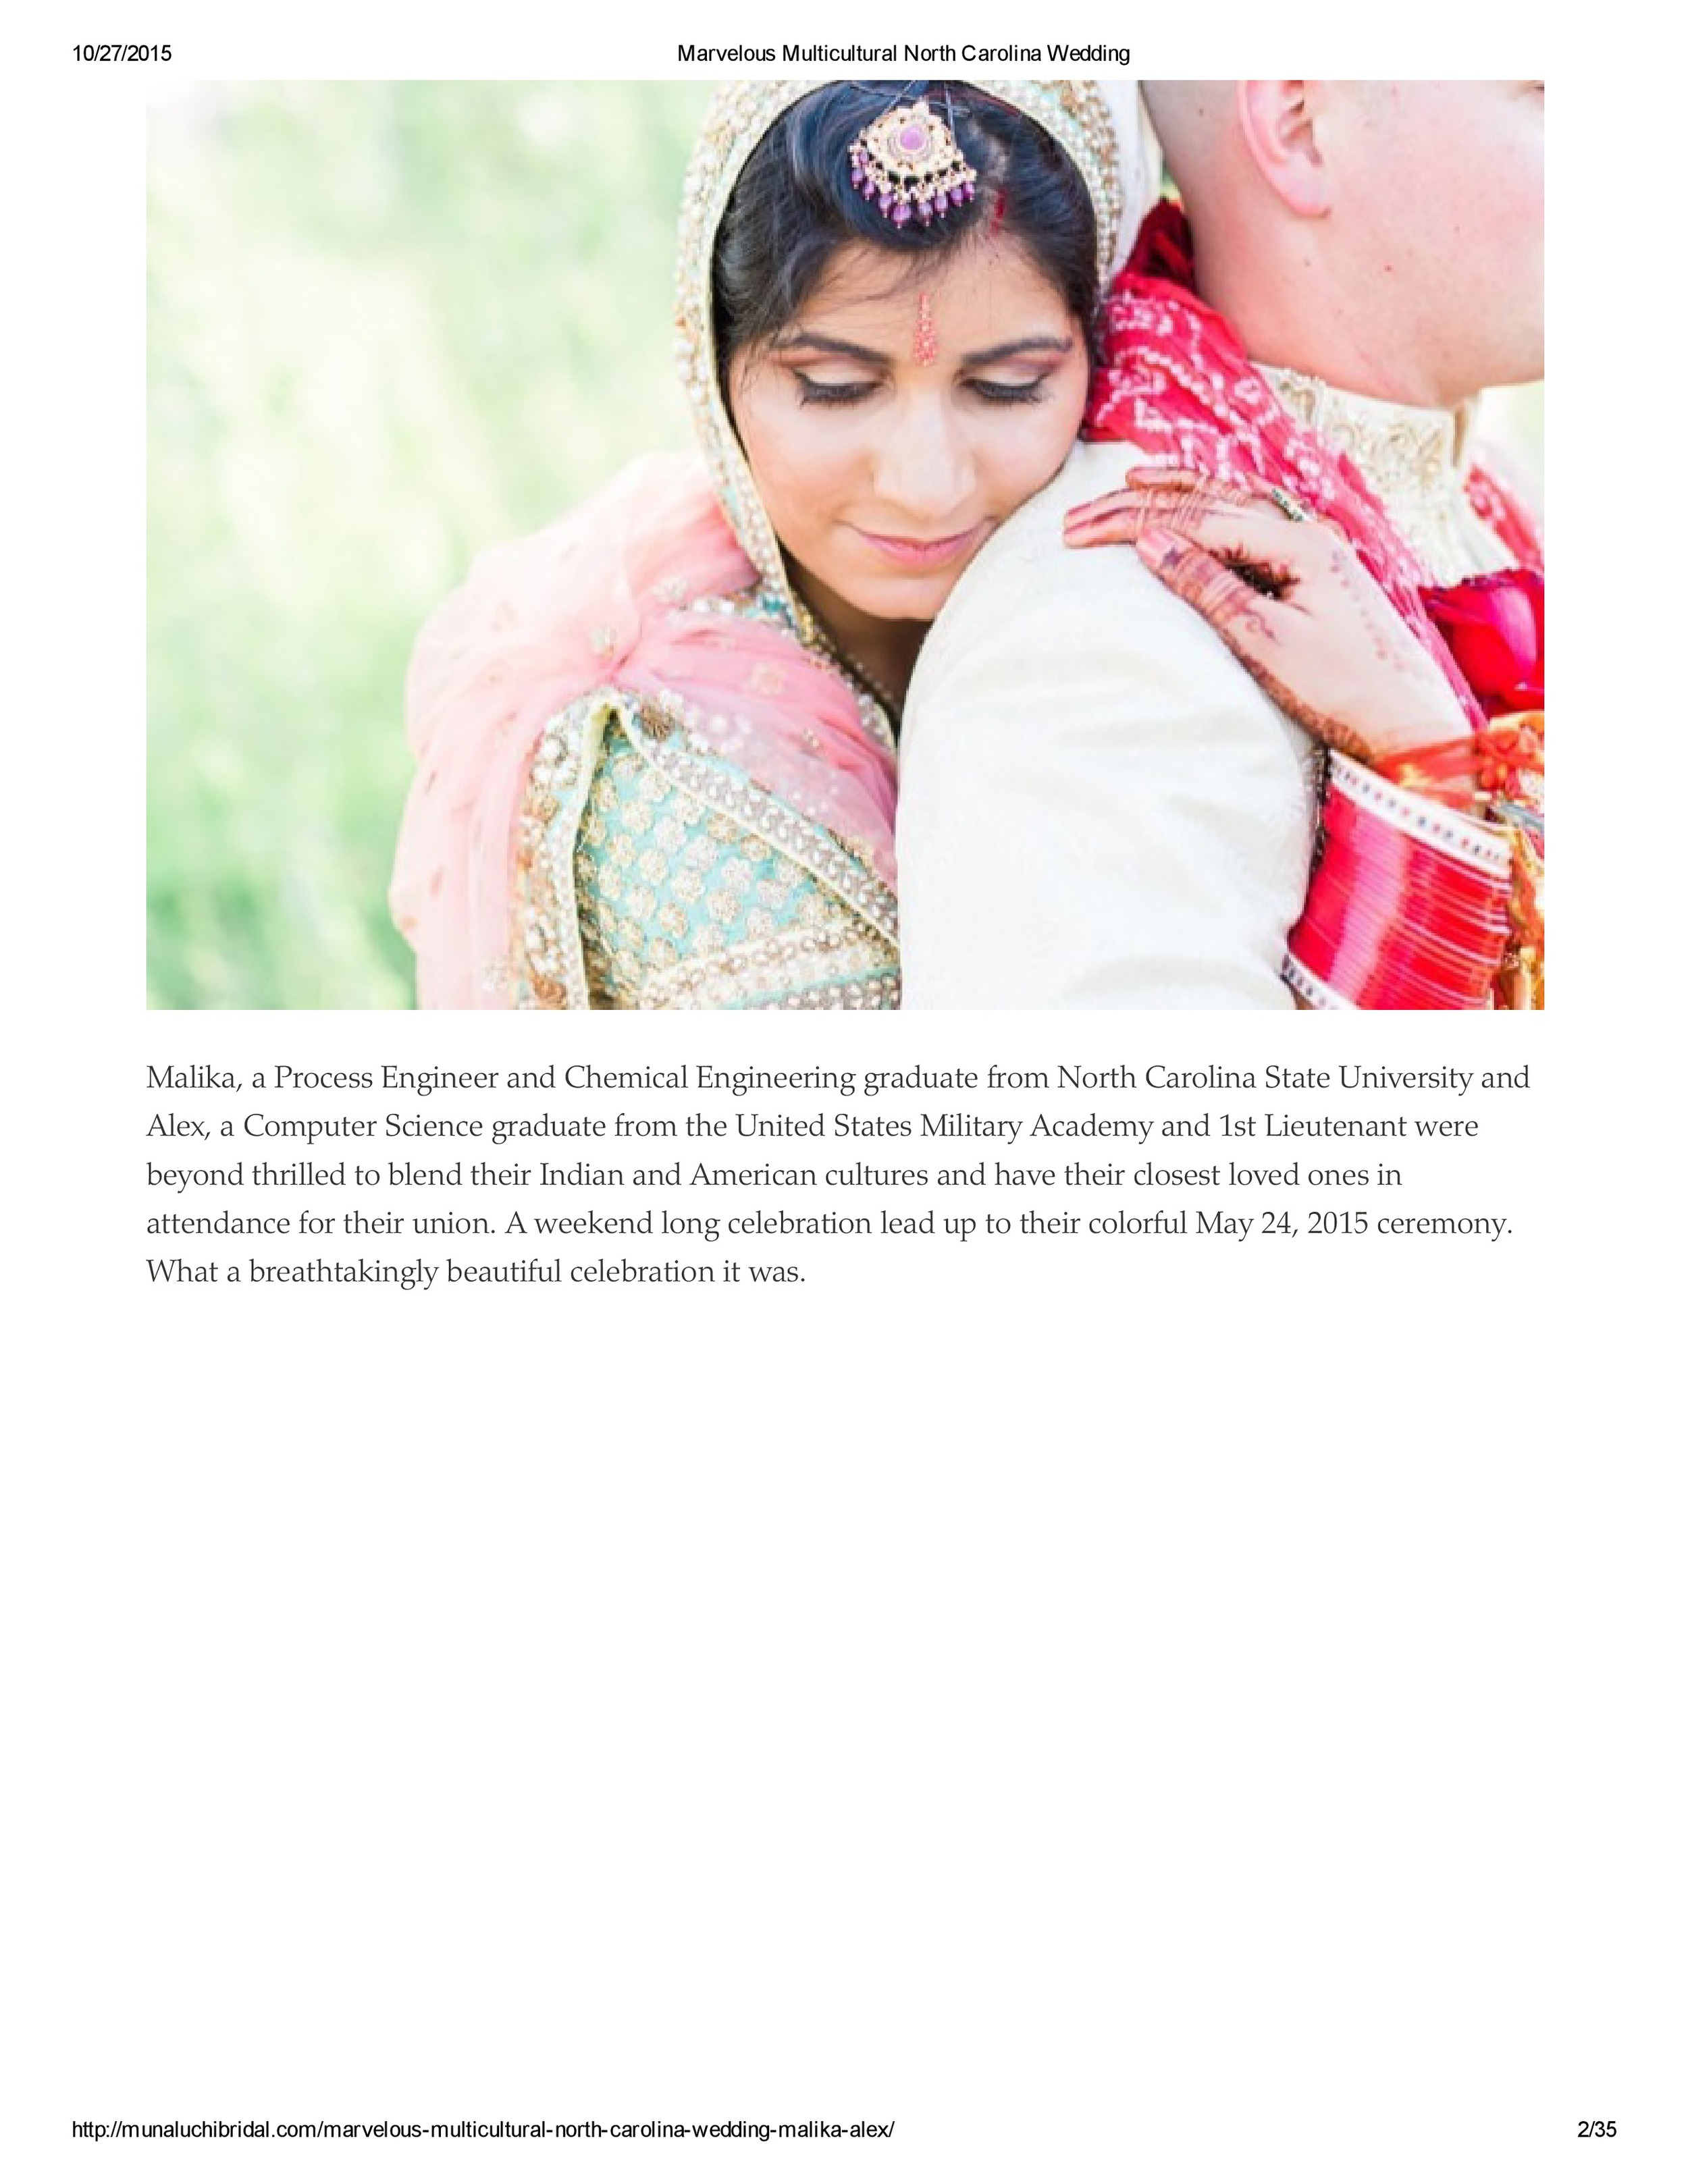 Marvelous Multicultural North Carolina Wedding - Alex & Malika-page-1.jpg